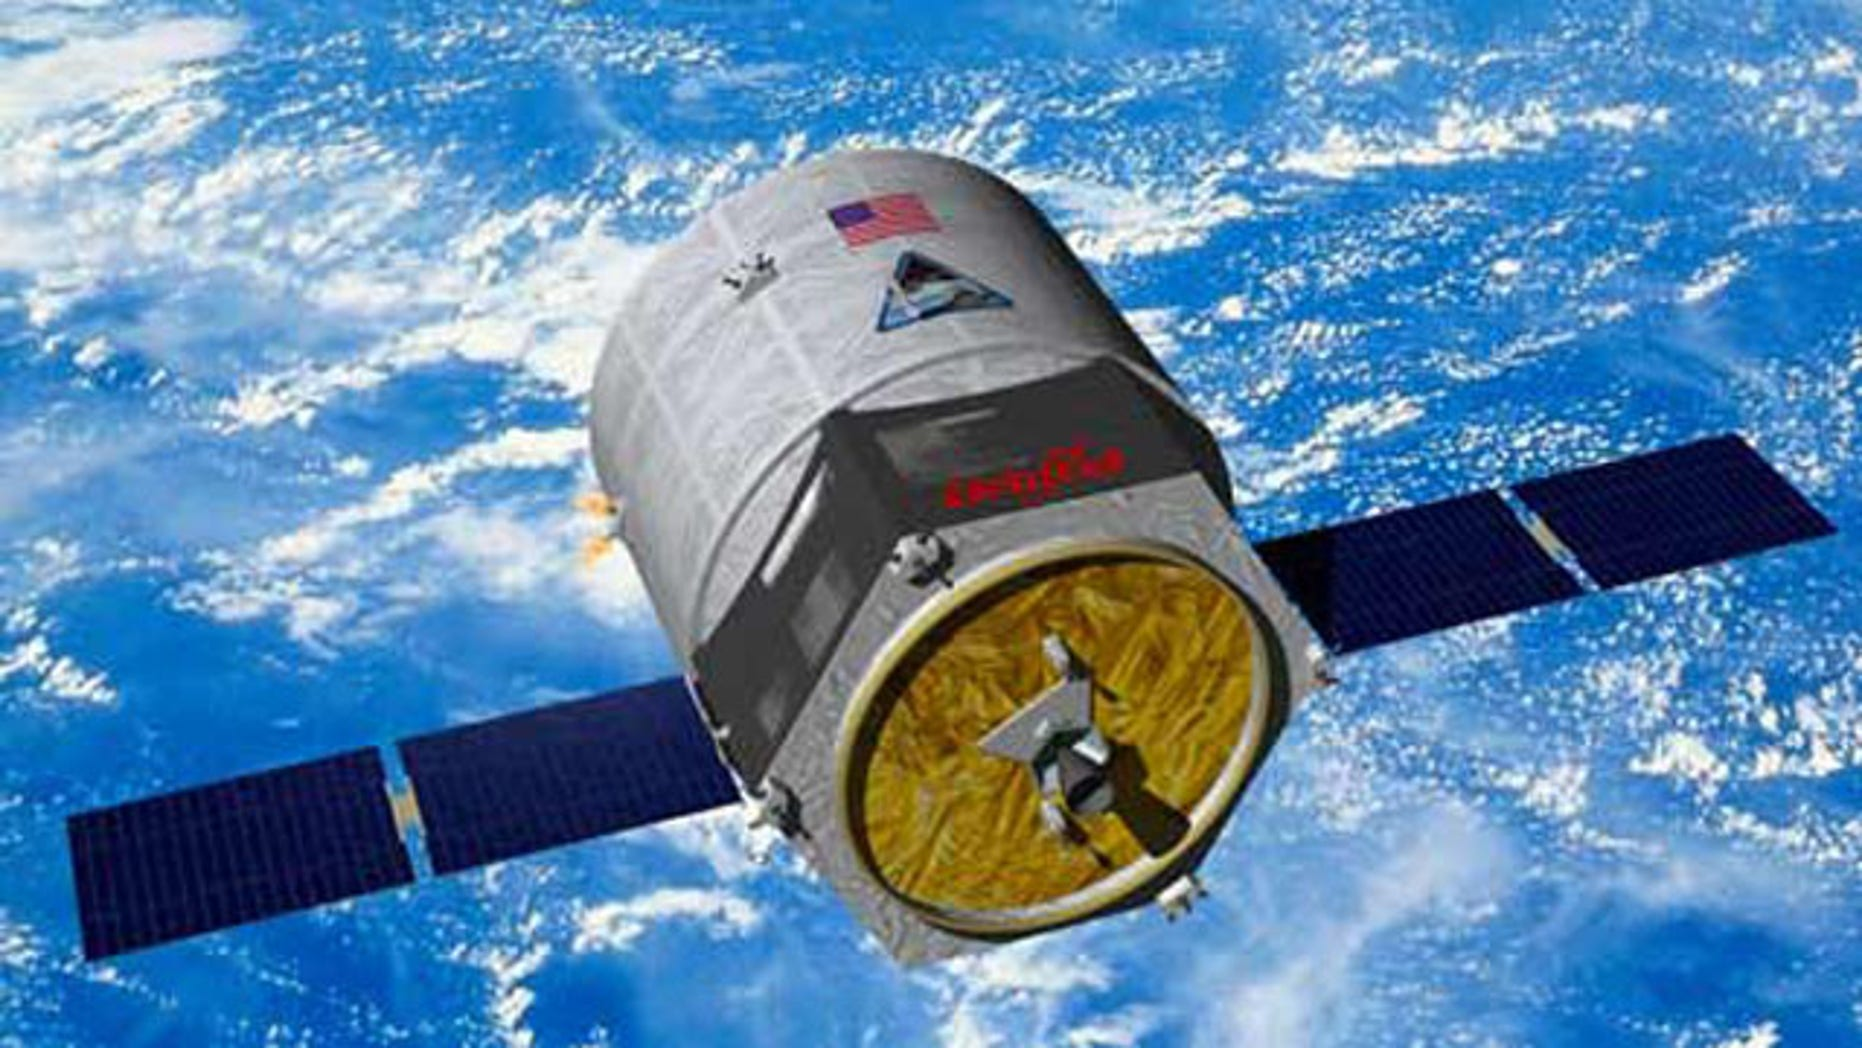 Artist rendering of Orbital Science's Cygnus cargo spacecraft approaching the International Space Station.